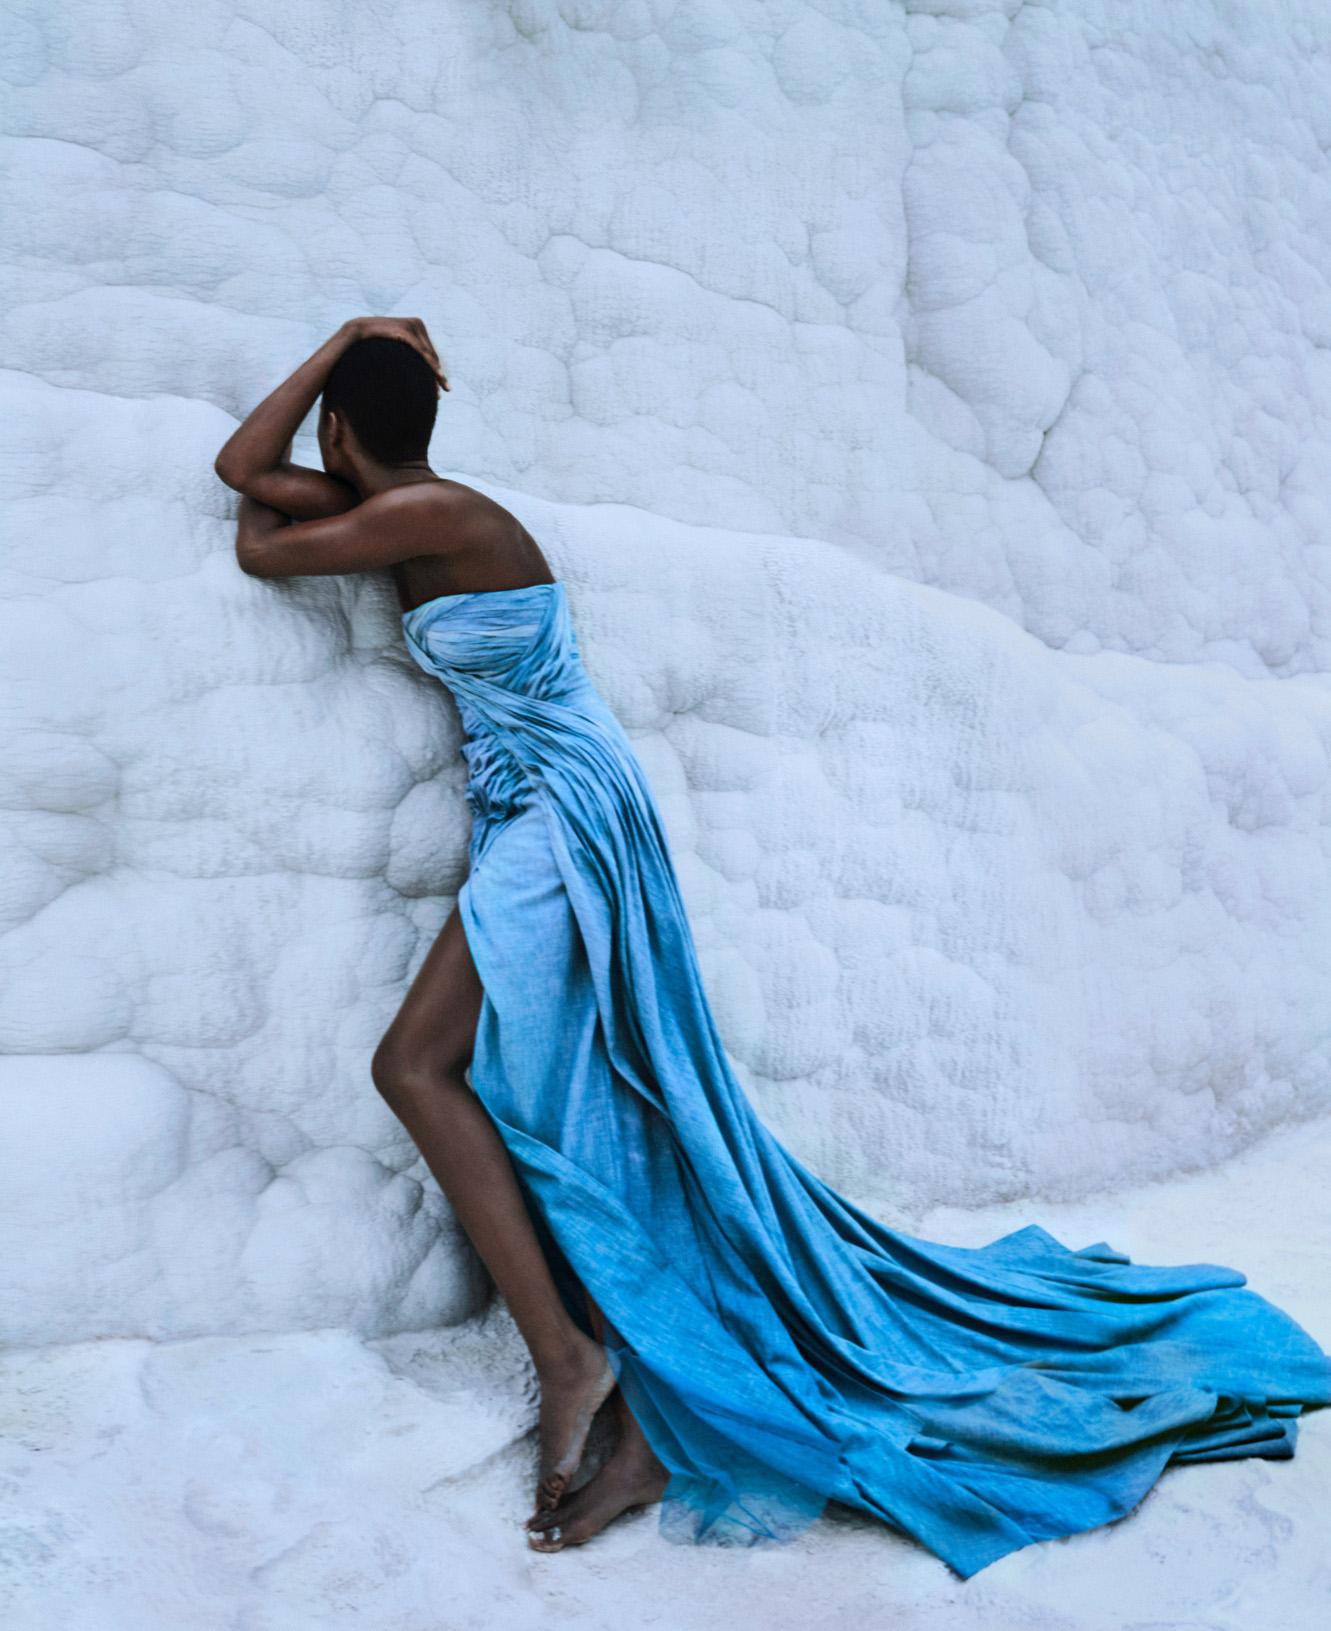 Mayowa Nicholas by Txema Yeste for Harper's Bazaar US March 2020